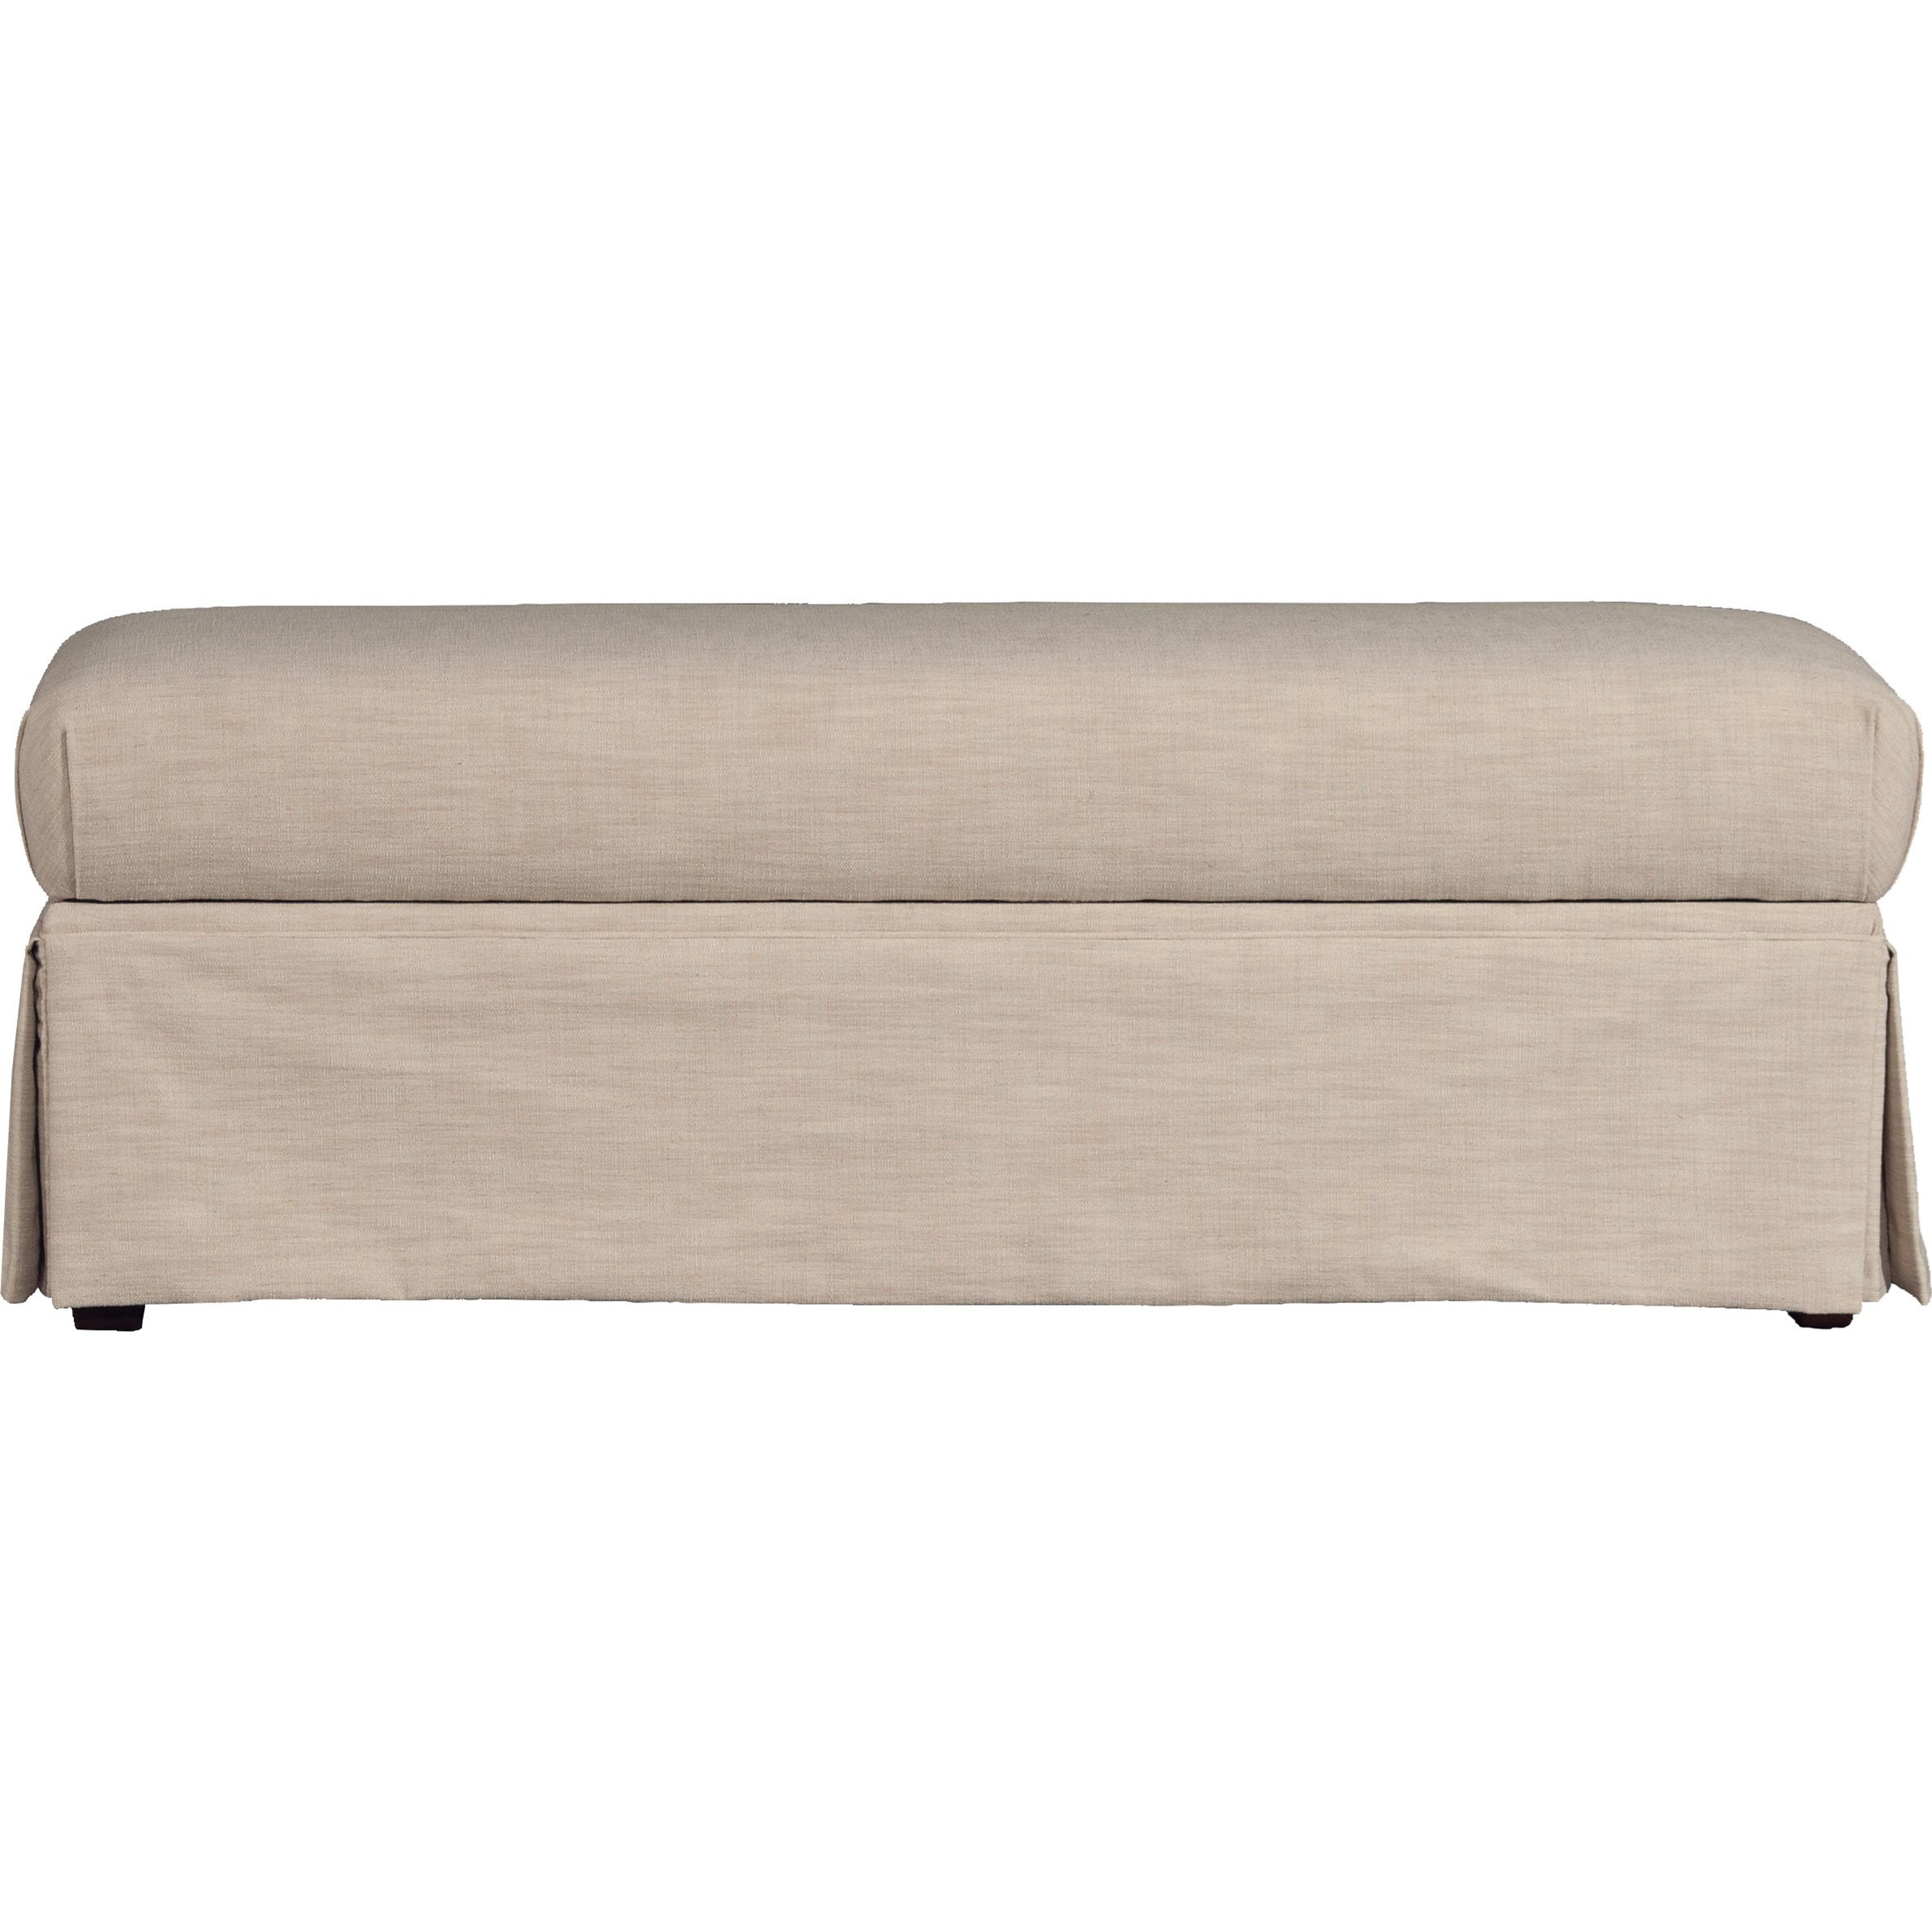 7130 Standard Bench by Mayo at Pedigo Furniture